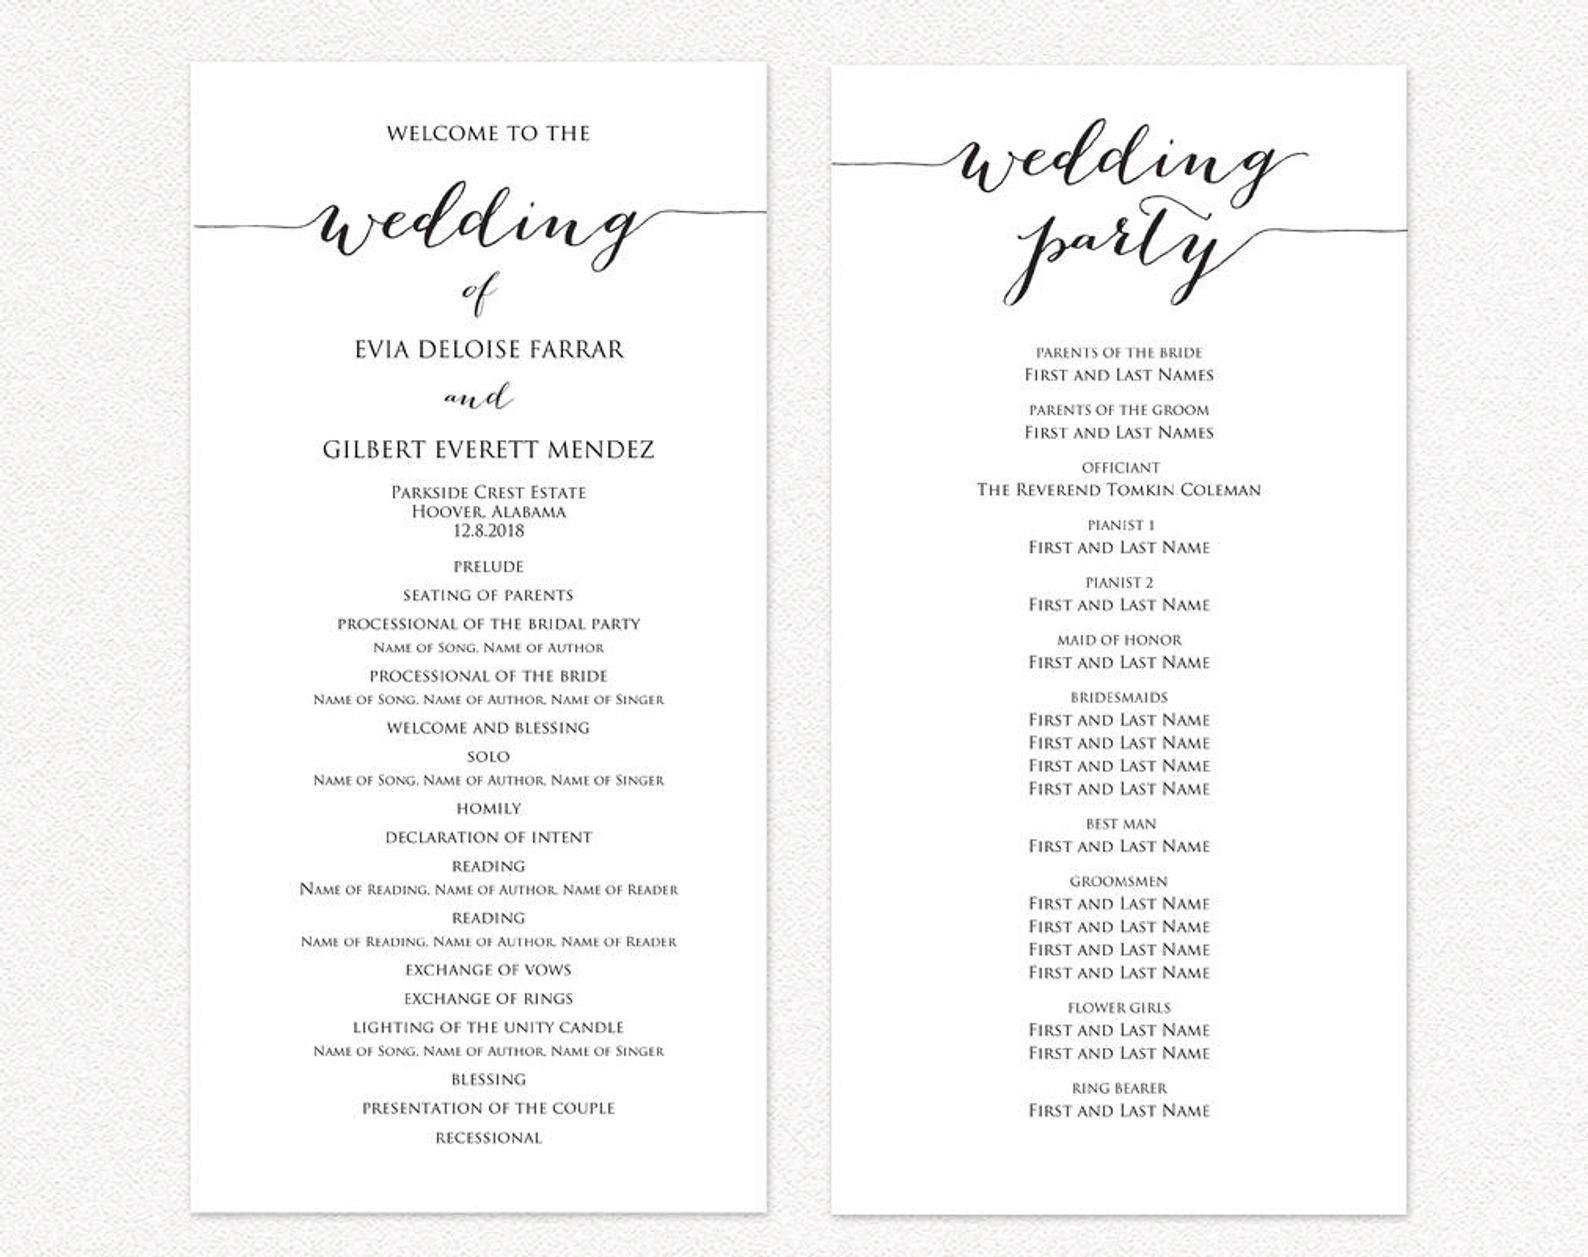 Wedding Program Two Templates Ceremony Program Template Diy Etsy In 2021 Wedding Programs Template Wedding Ceremony Programs Template Ceremony Program Template Wedding reception program template free